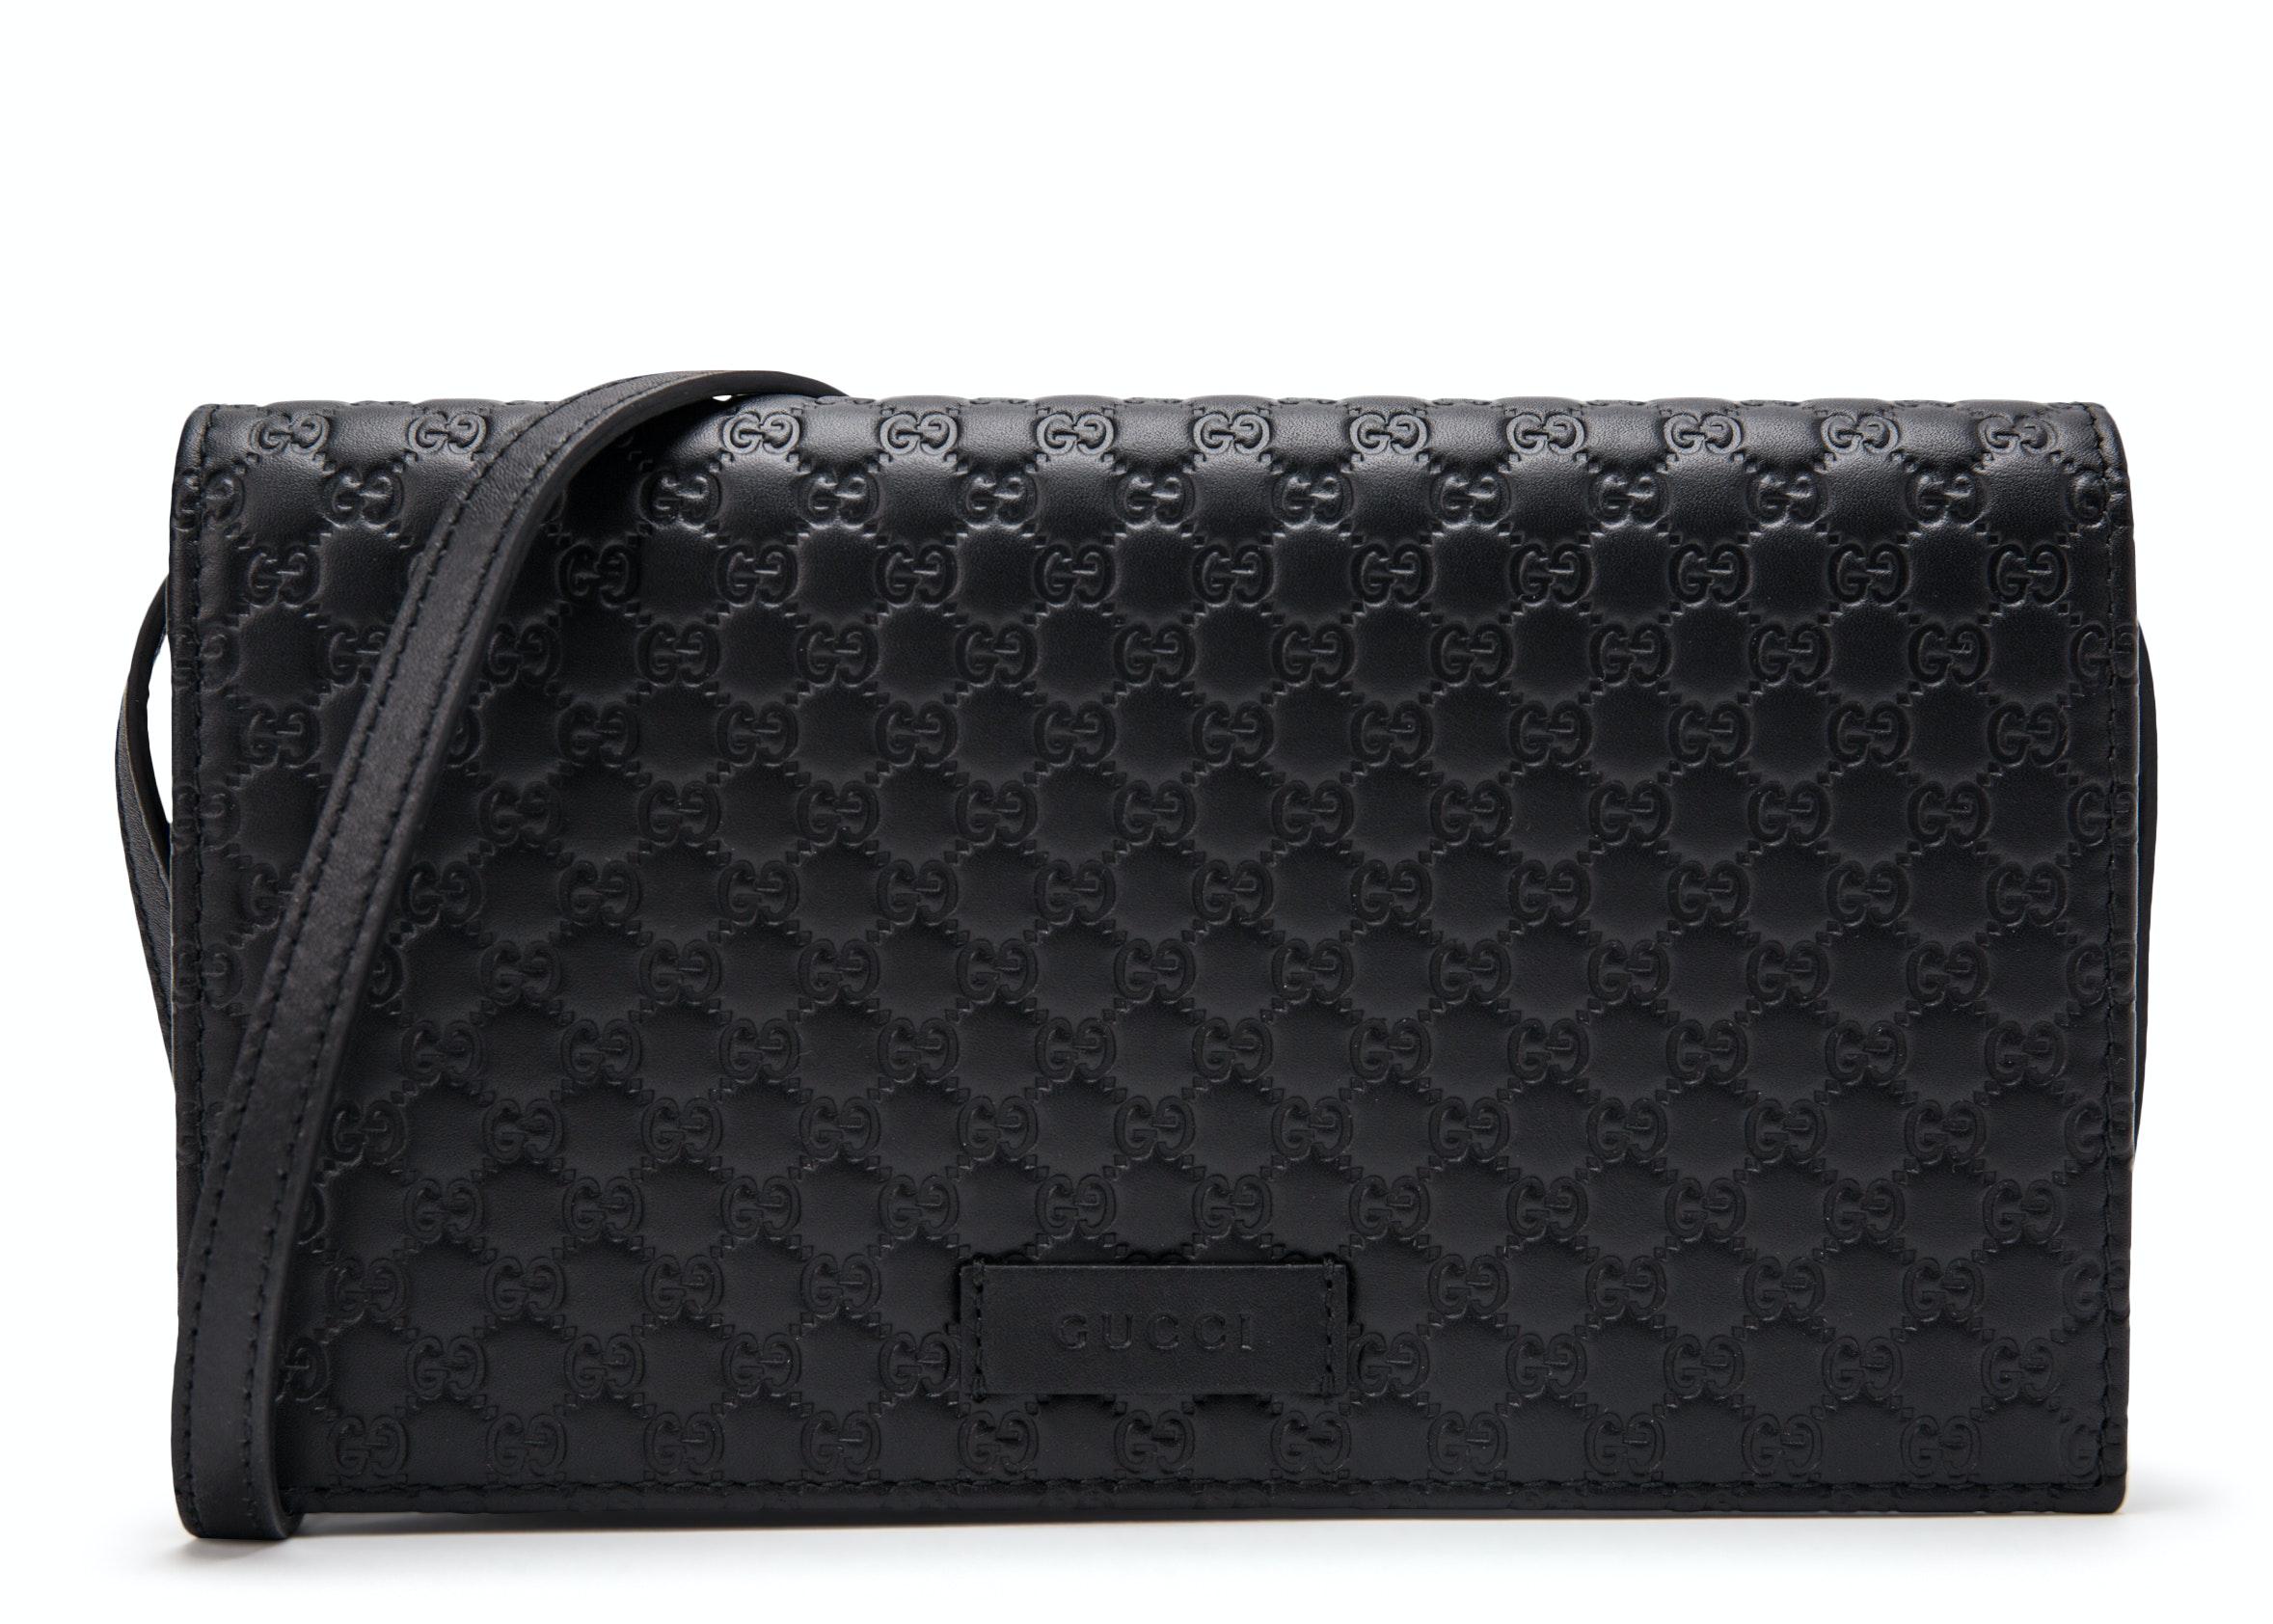 Gucci Wallet Crossbody MircoGuccissima Black